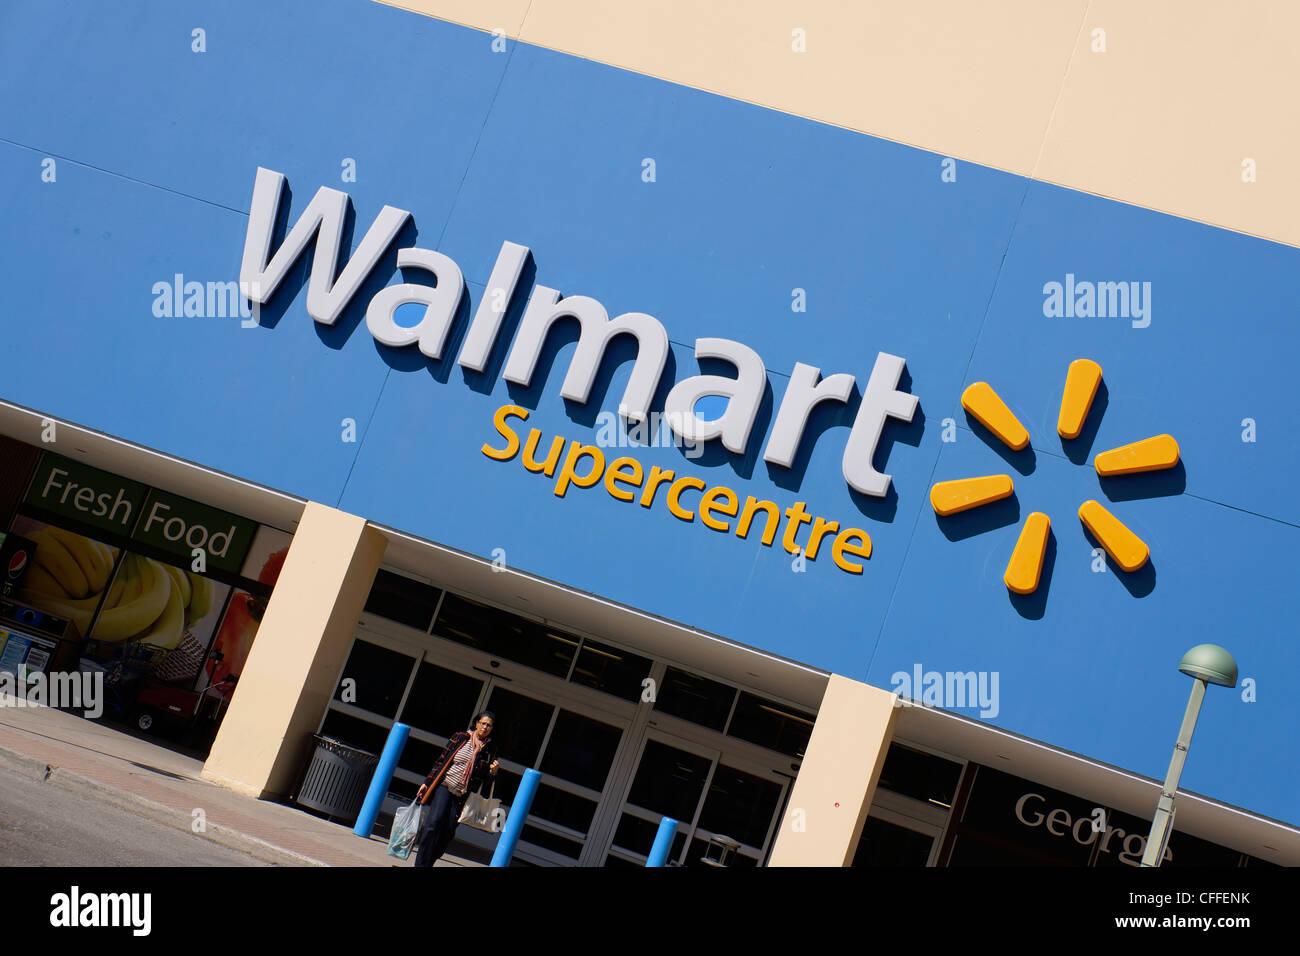 Walmart Store Sign Supercentre Stock Photos & Walmart Store Sign ...